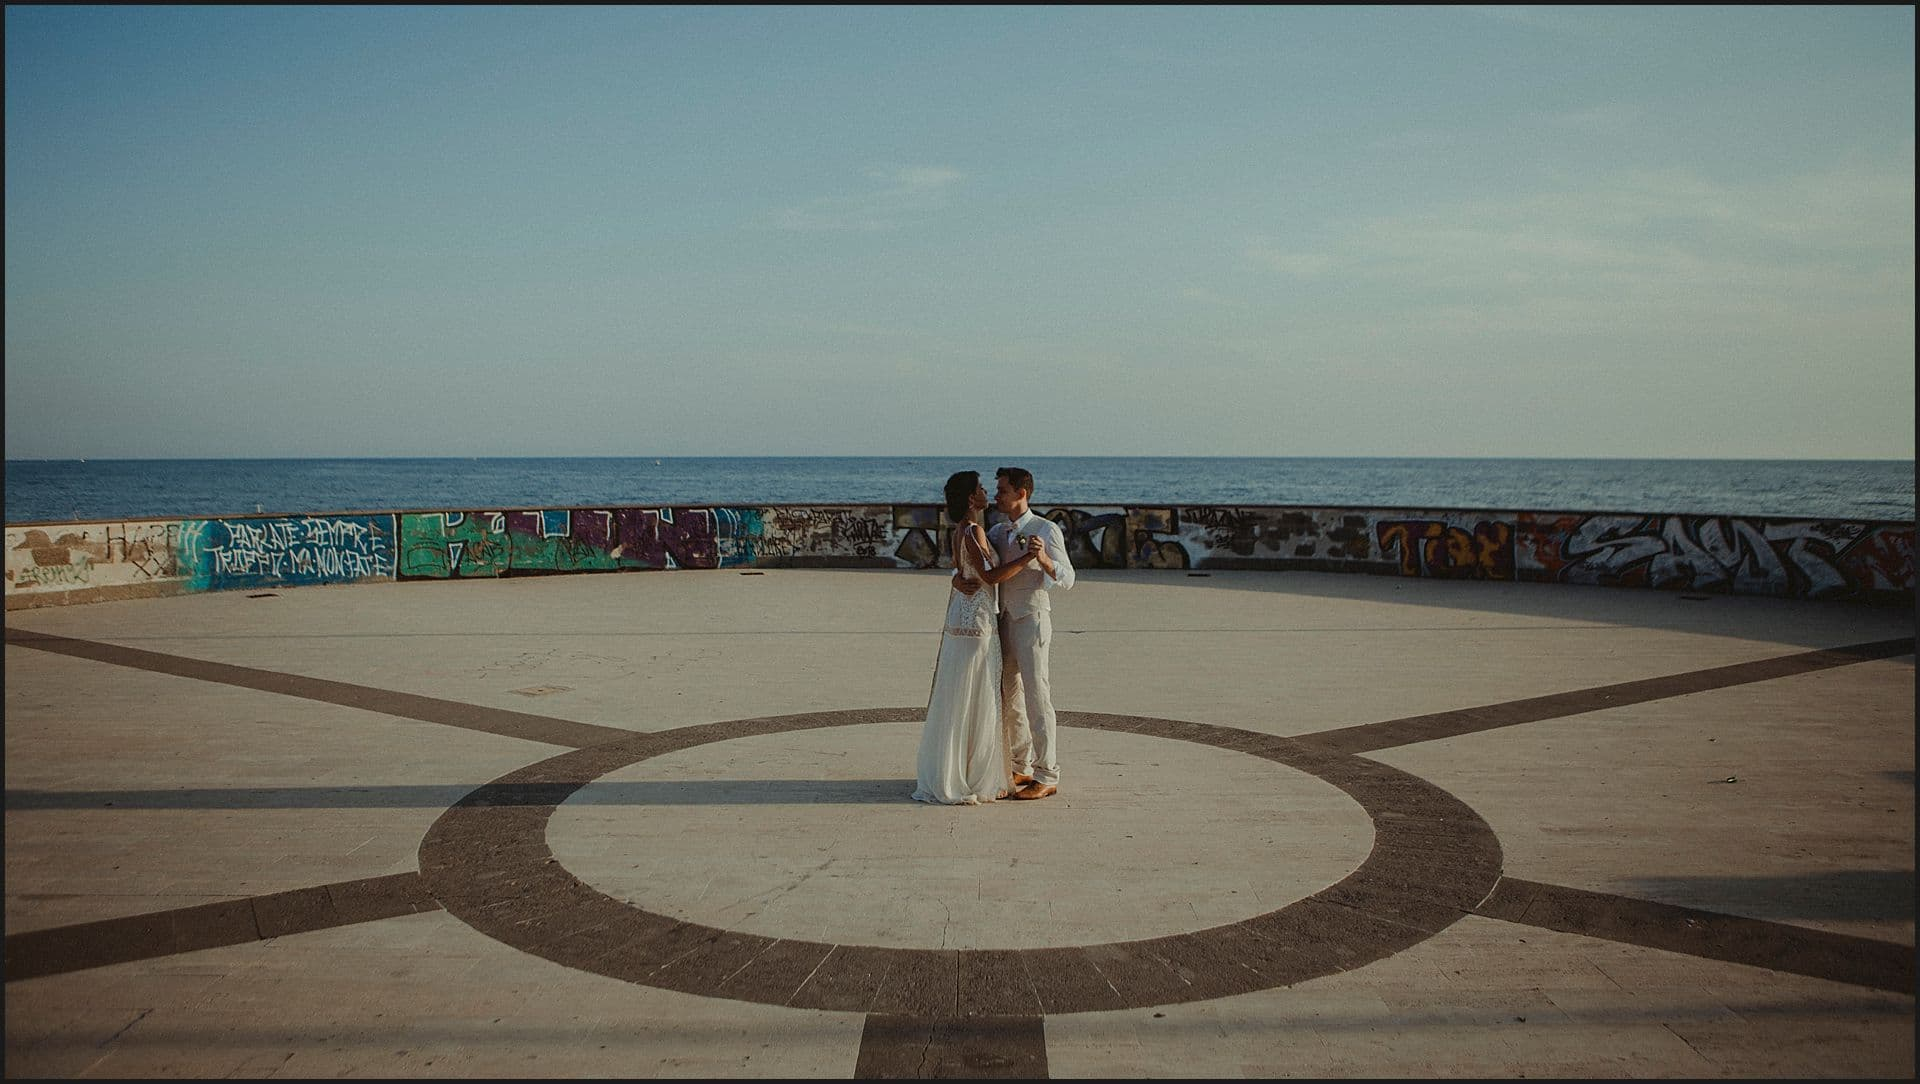 bride and groom, dancing, symmetry, geometries, landscape, sunset, sea, seaside, wedding by the sea